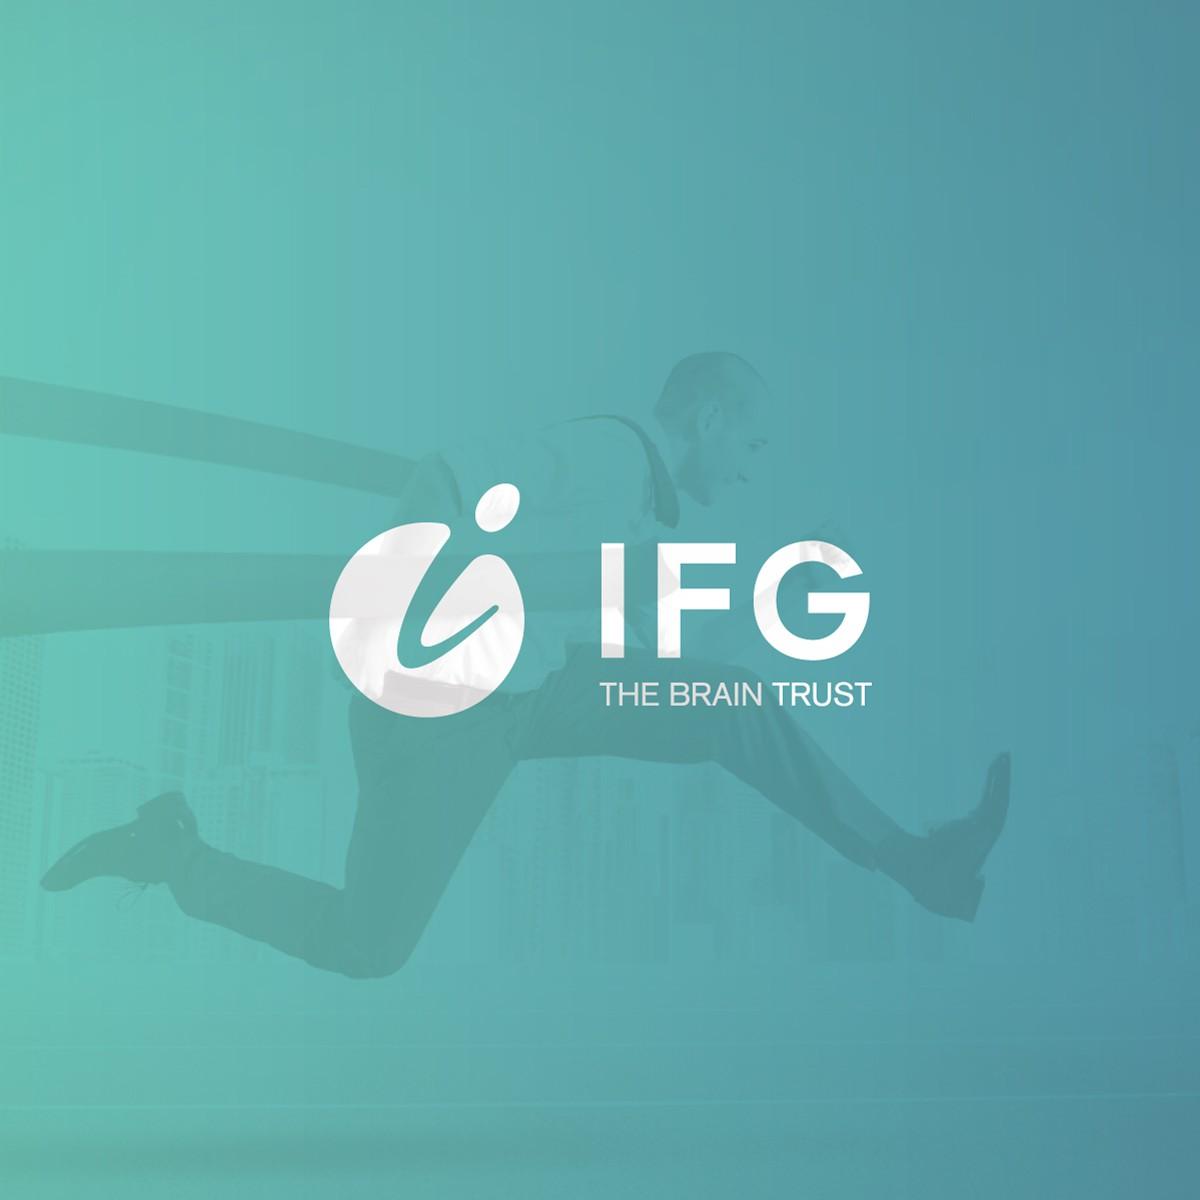 IFG Company Logo Project